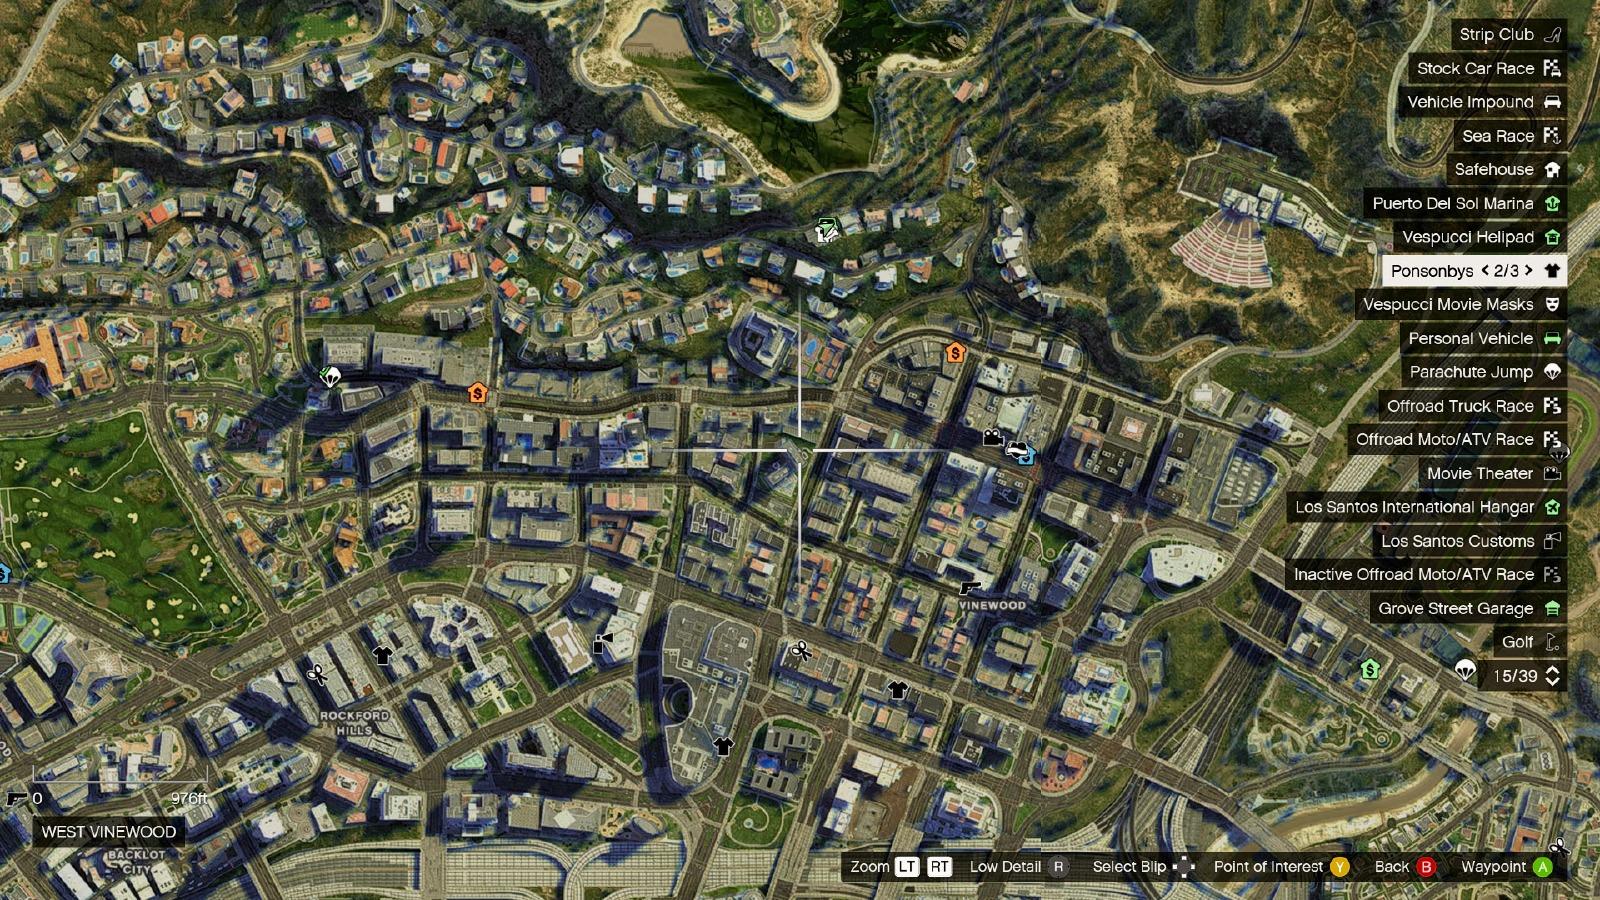 3d Max Wallpaper Texture Gta Modding Com Download Area 187 Gta V 187 Mods 187 Satellite